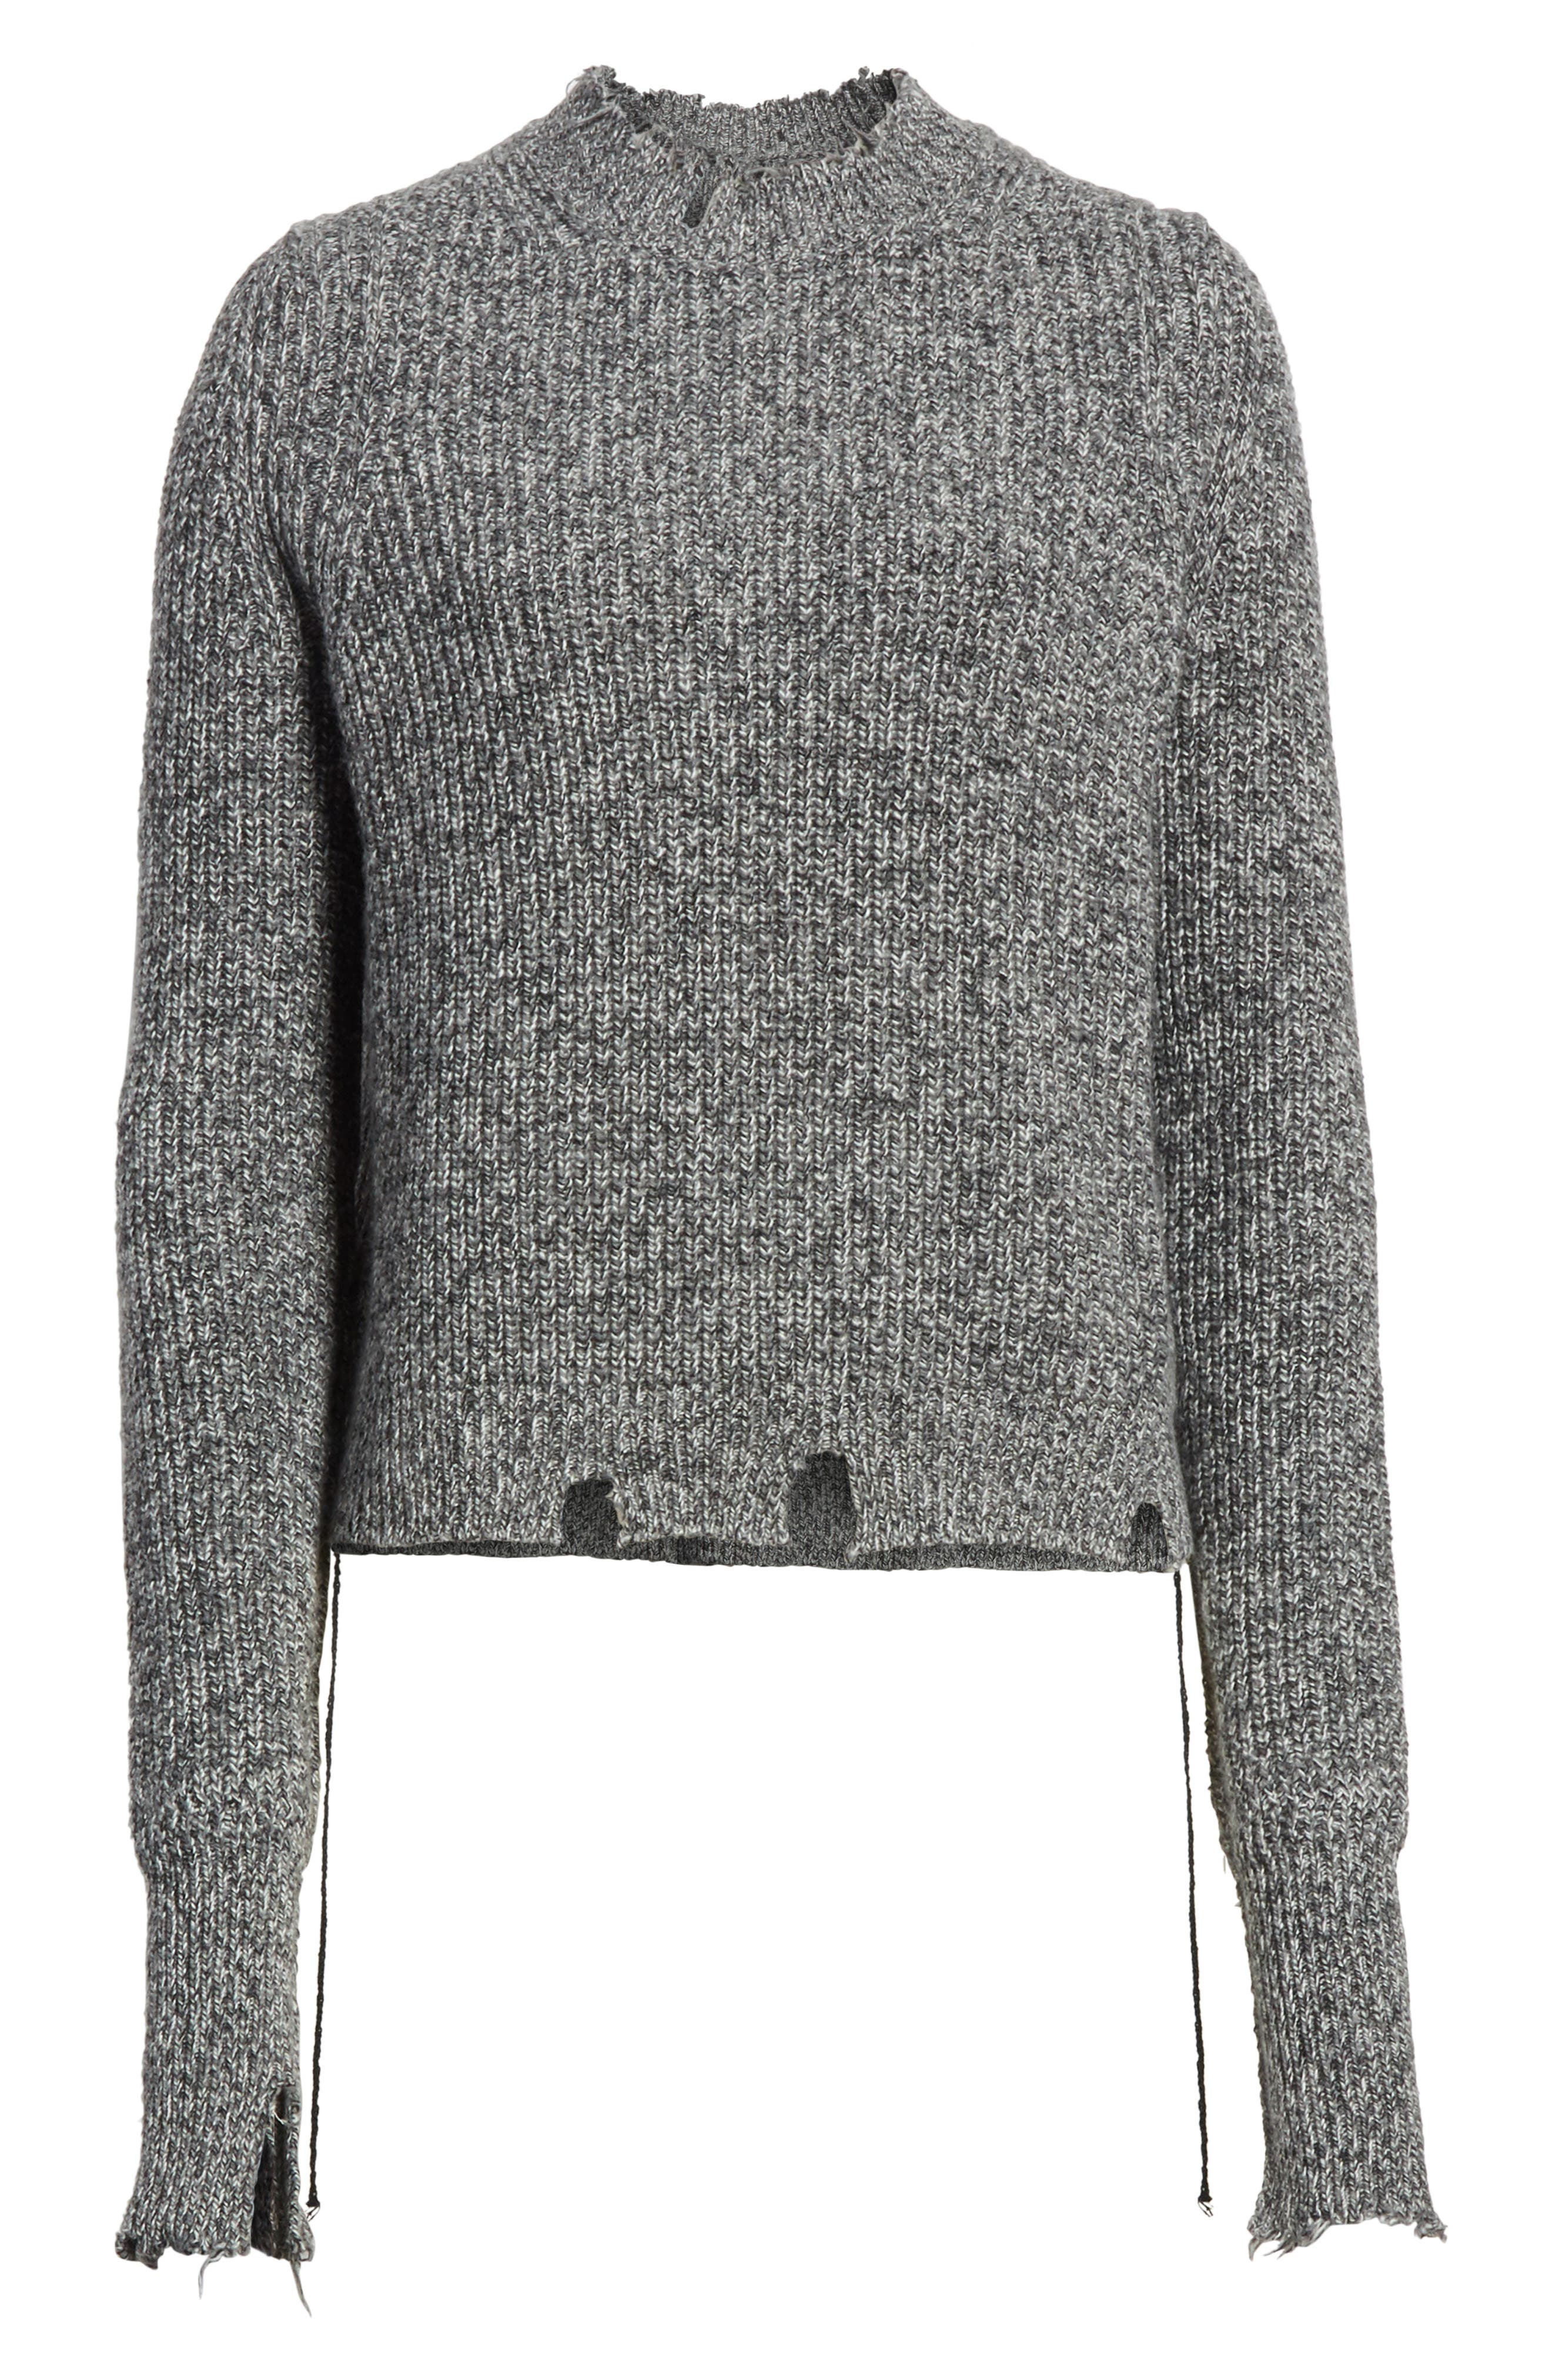 Grunge Marl Sweater,                             Alternate thumbnail 6, color,                             020